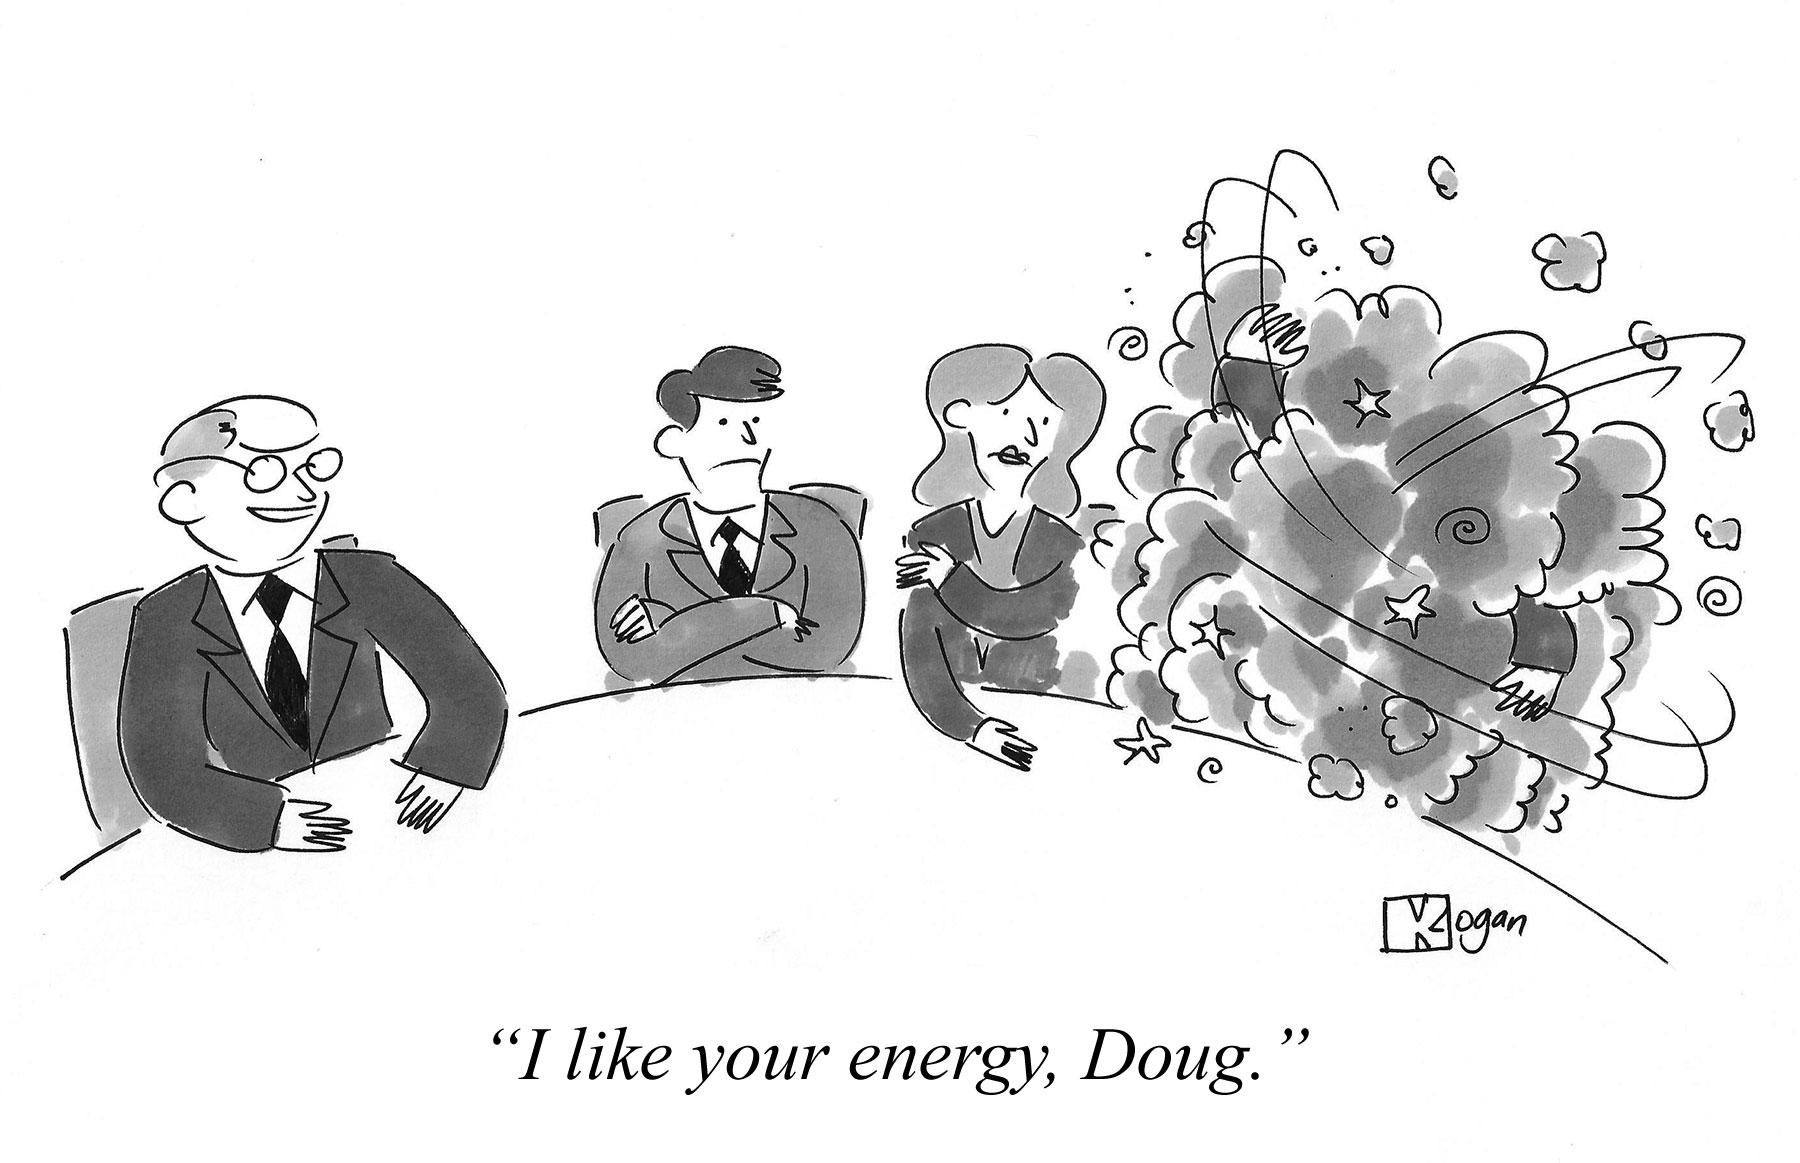 Cartoon about a high-energy employee